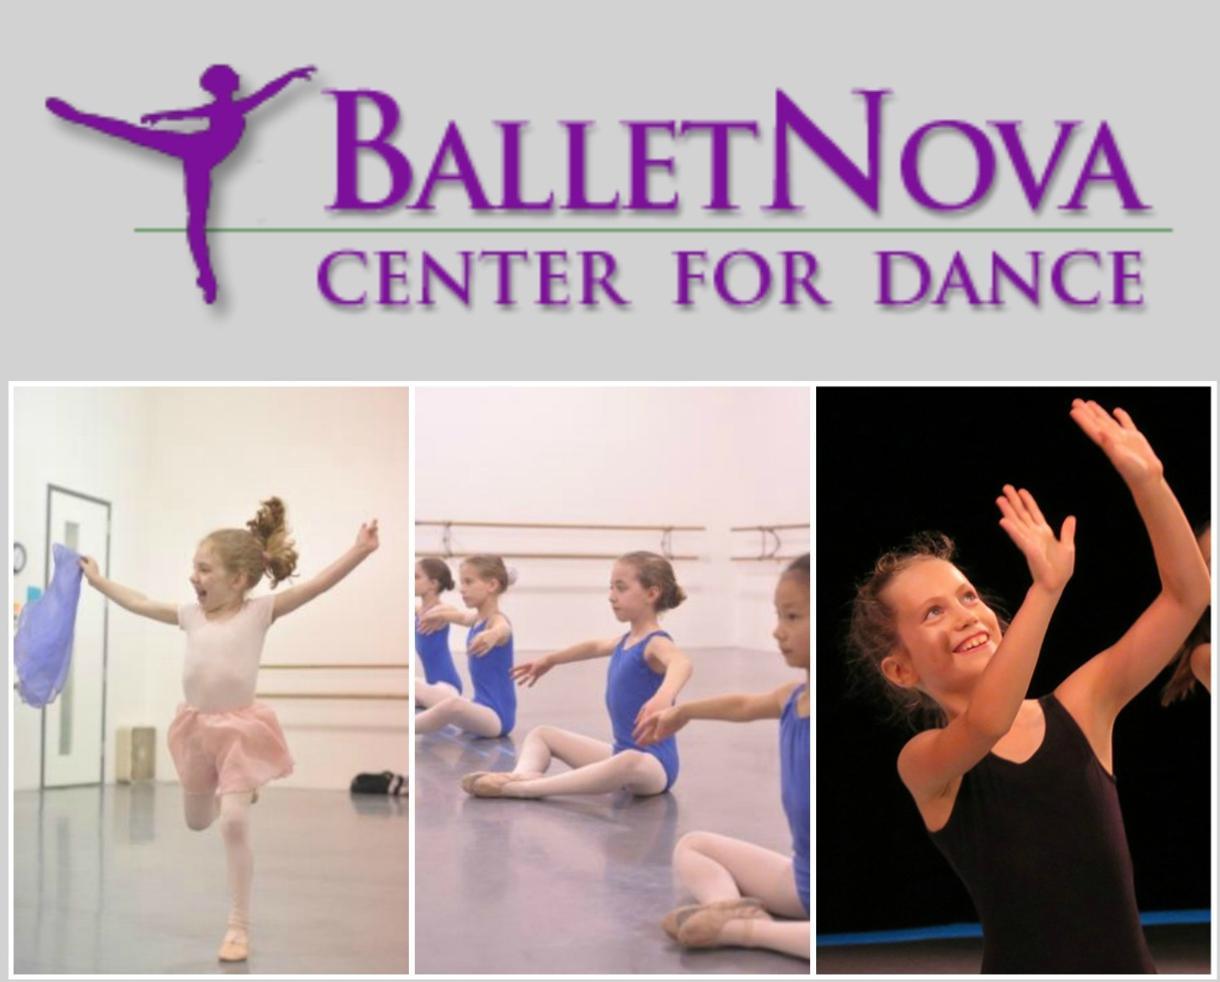 One Week of Half-Day BalletNova Young Children's Dance Camp